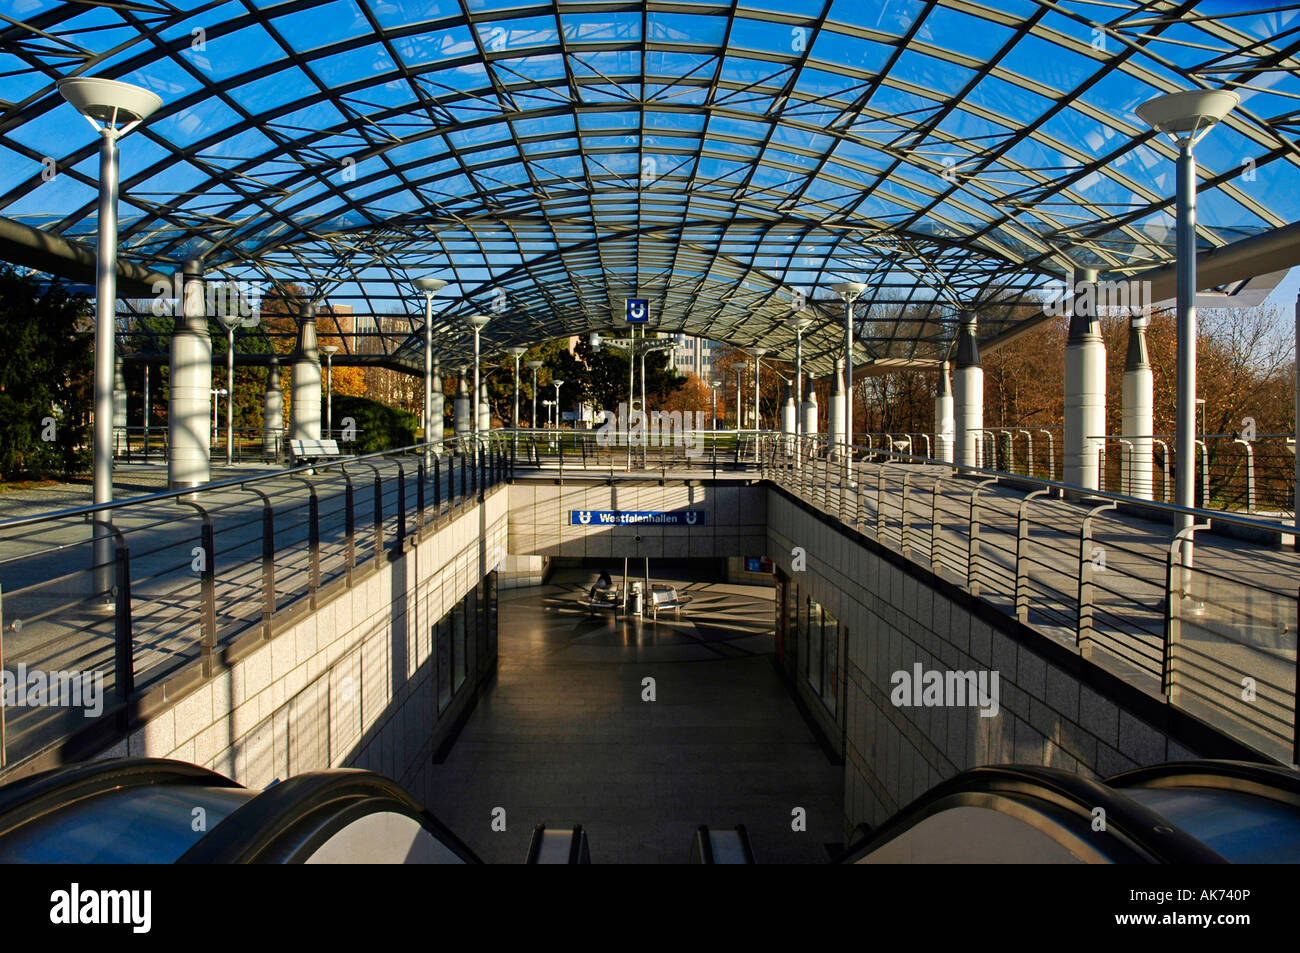 Metro station / Dortmund - Stock Image